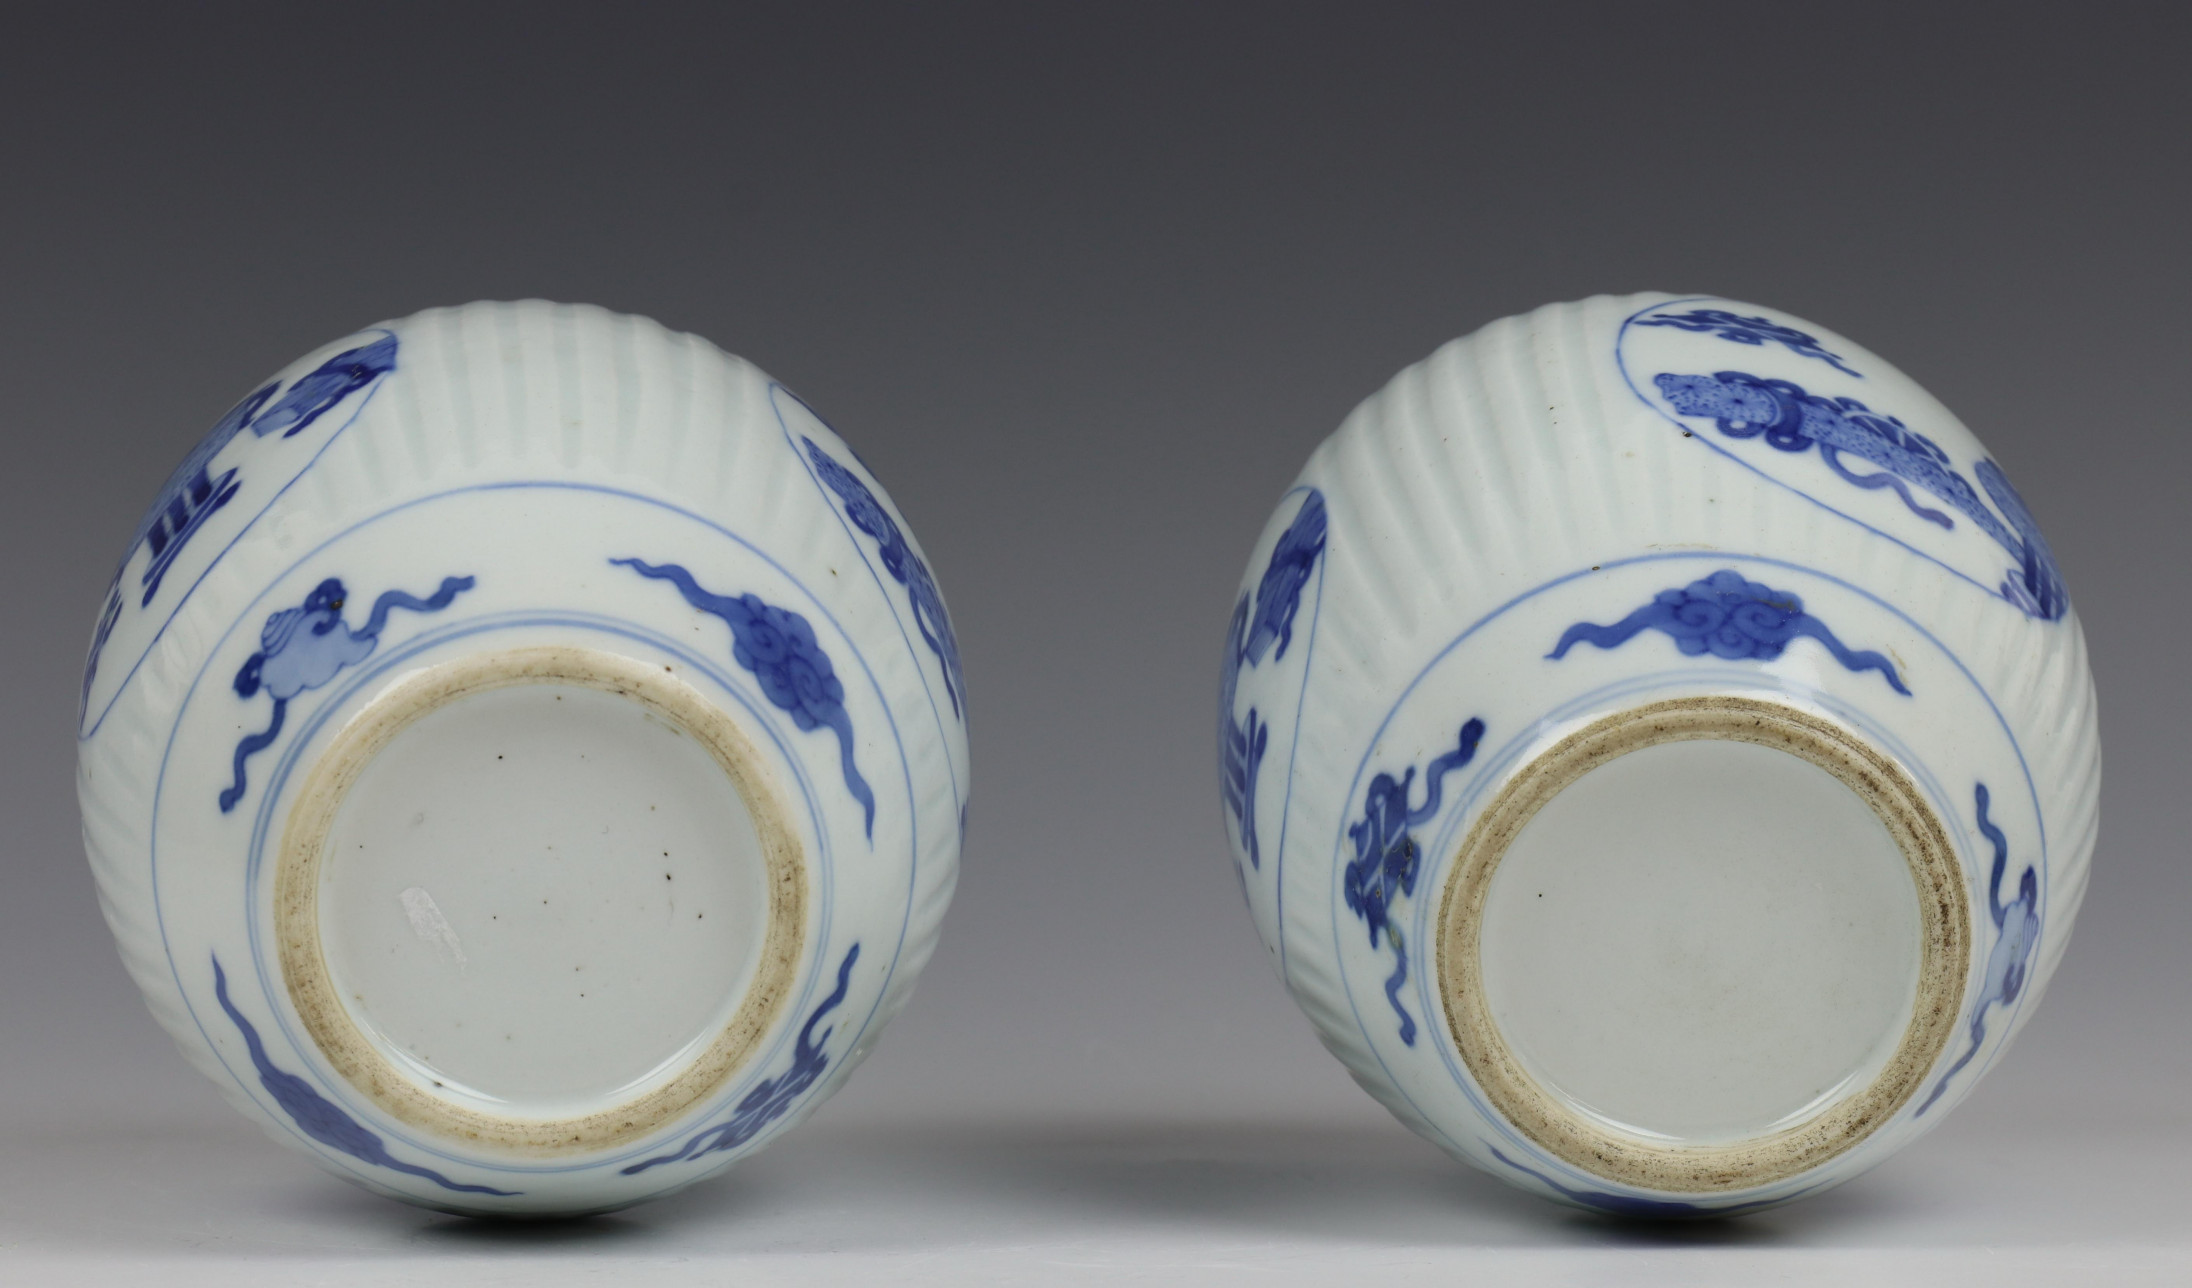 China, paar blauw-wit porseleinen gemberpotten in Kangxi stijl, - Image 5 of 5